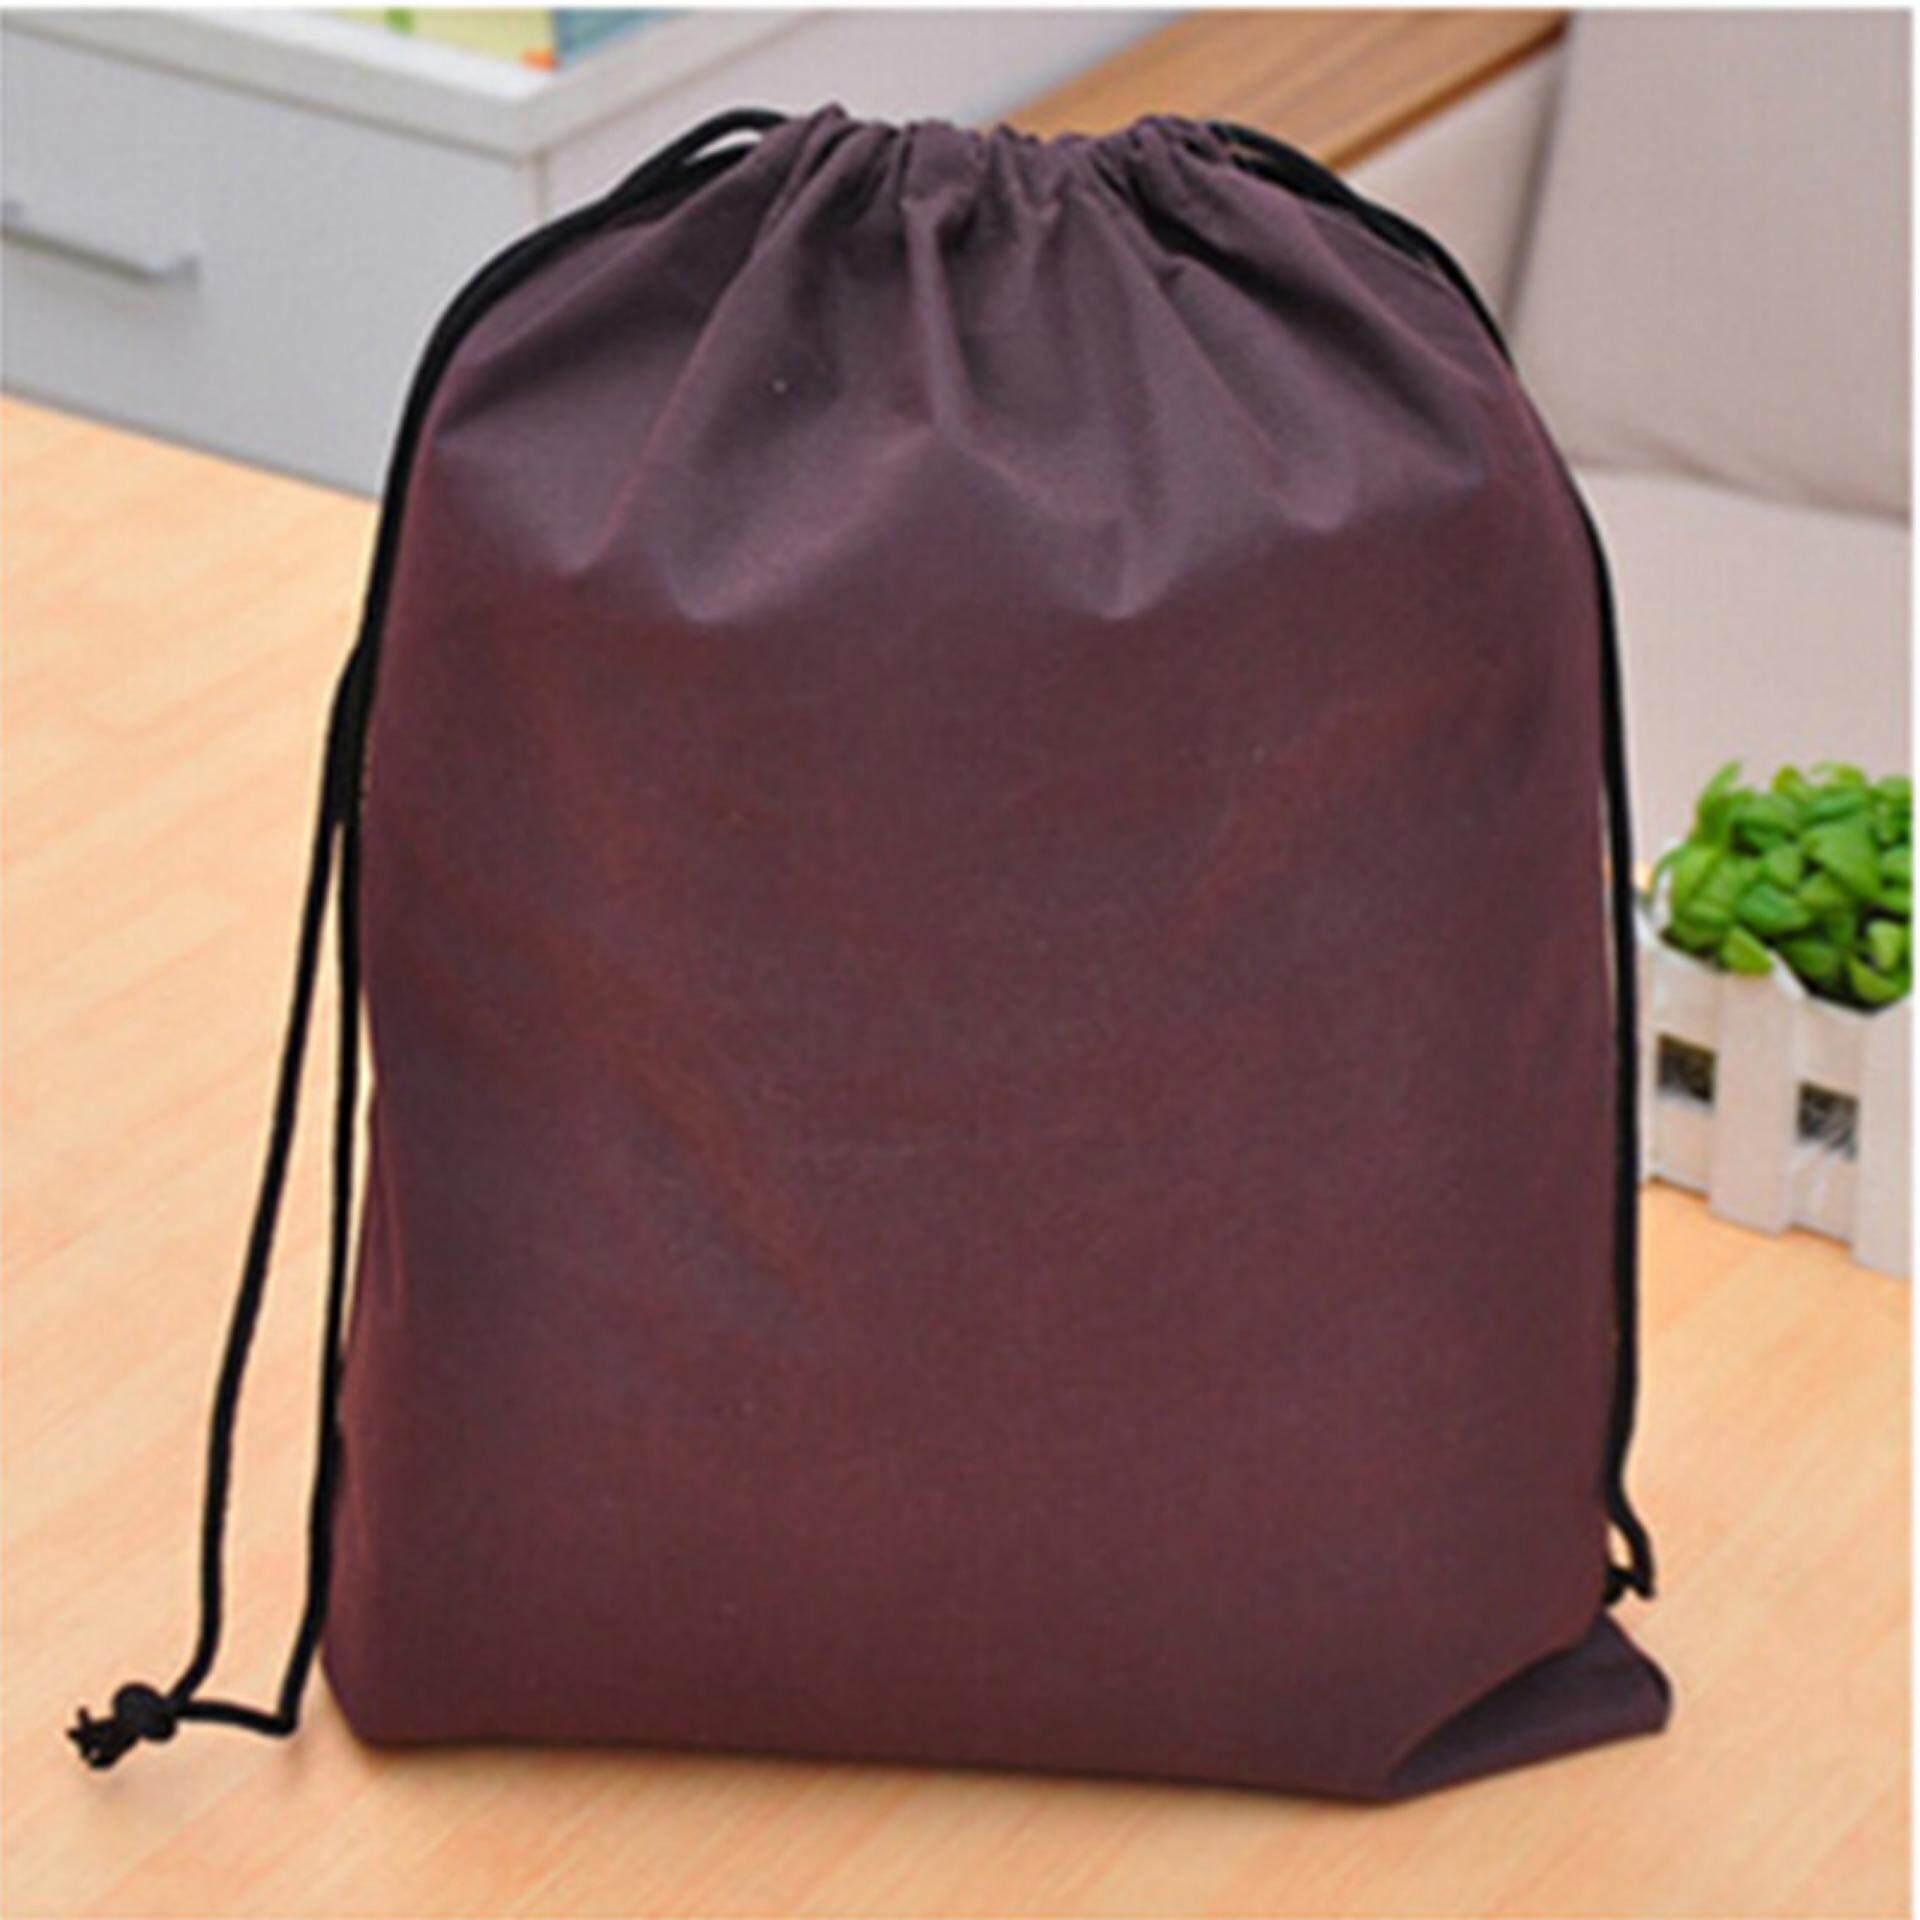 Drawstring Bags - Buy Drawstring Bags at Best Price in Malaysia ... d8c09568961db